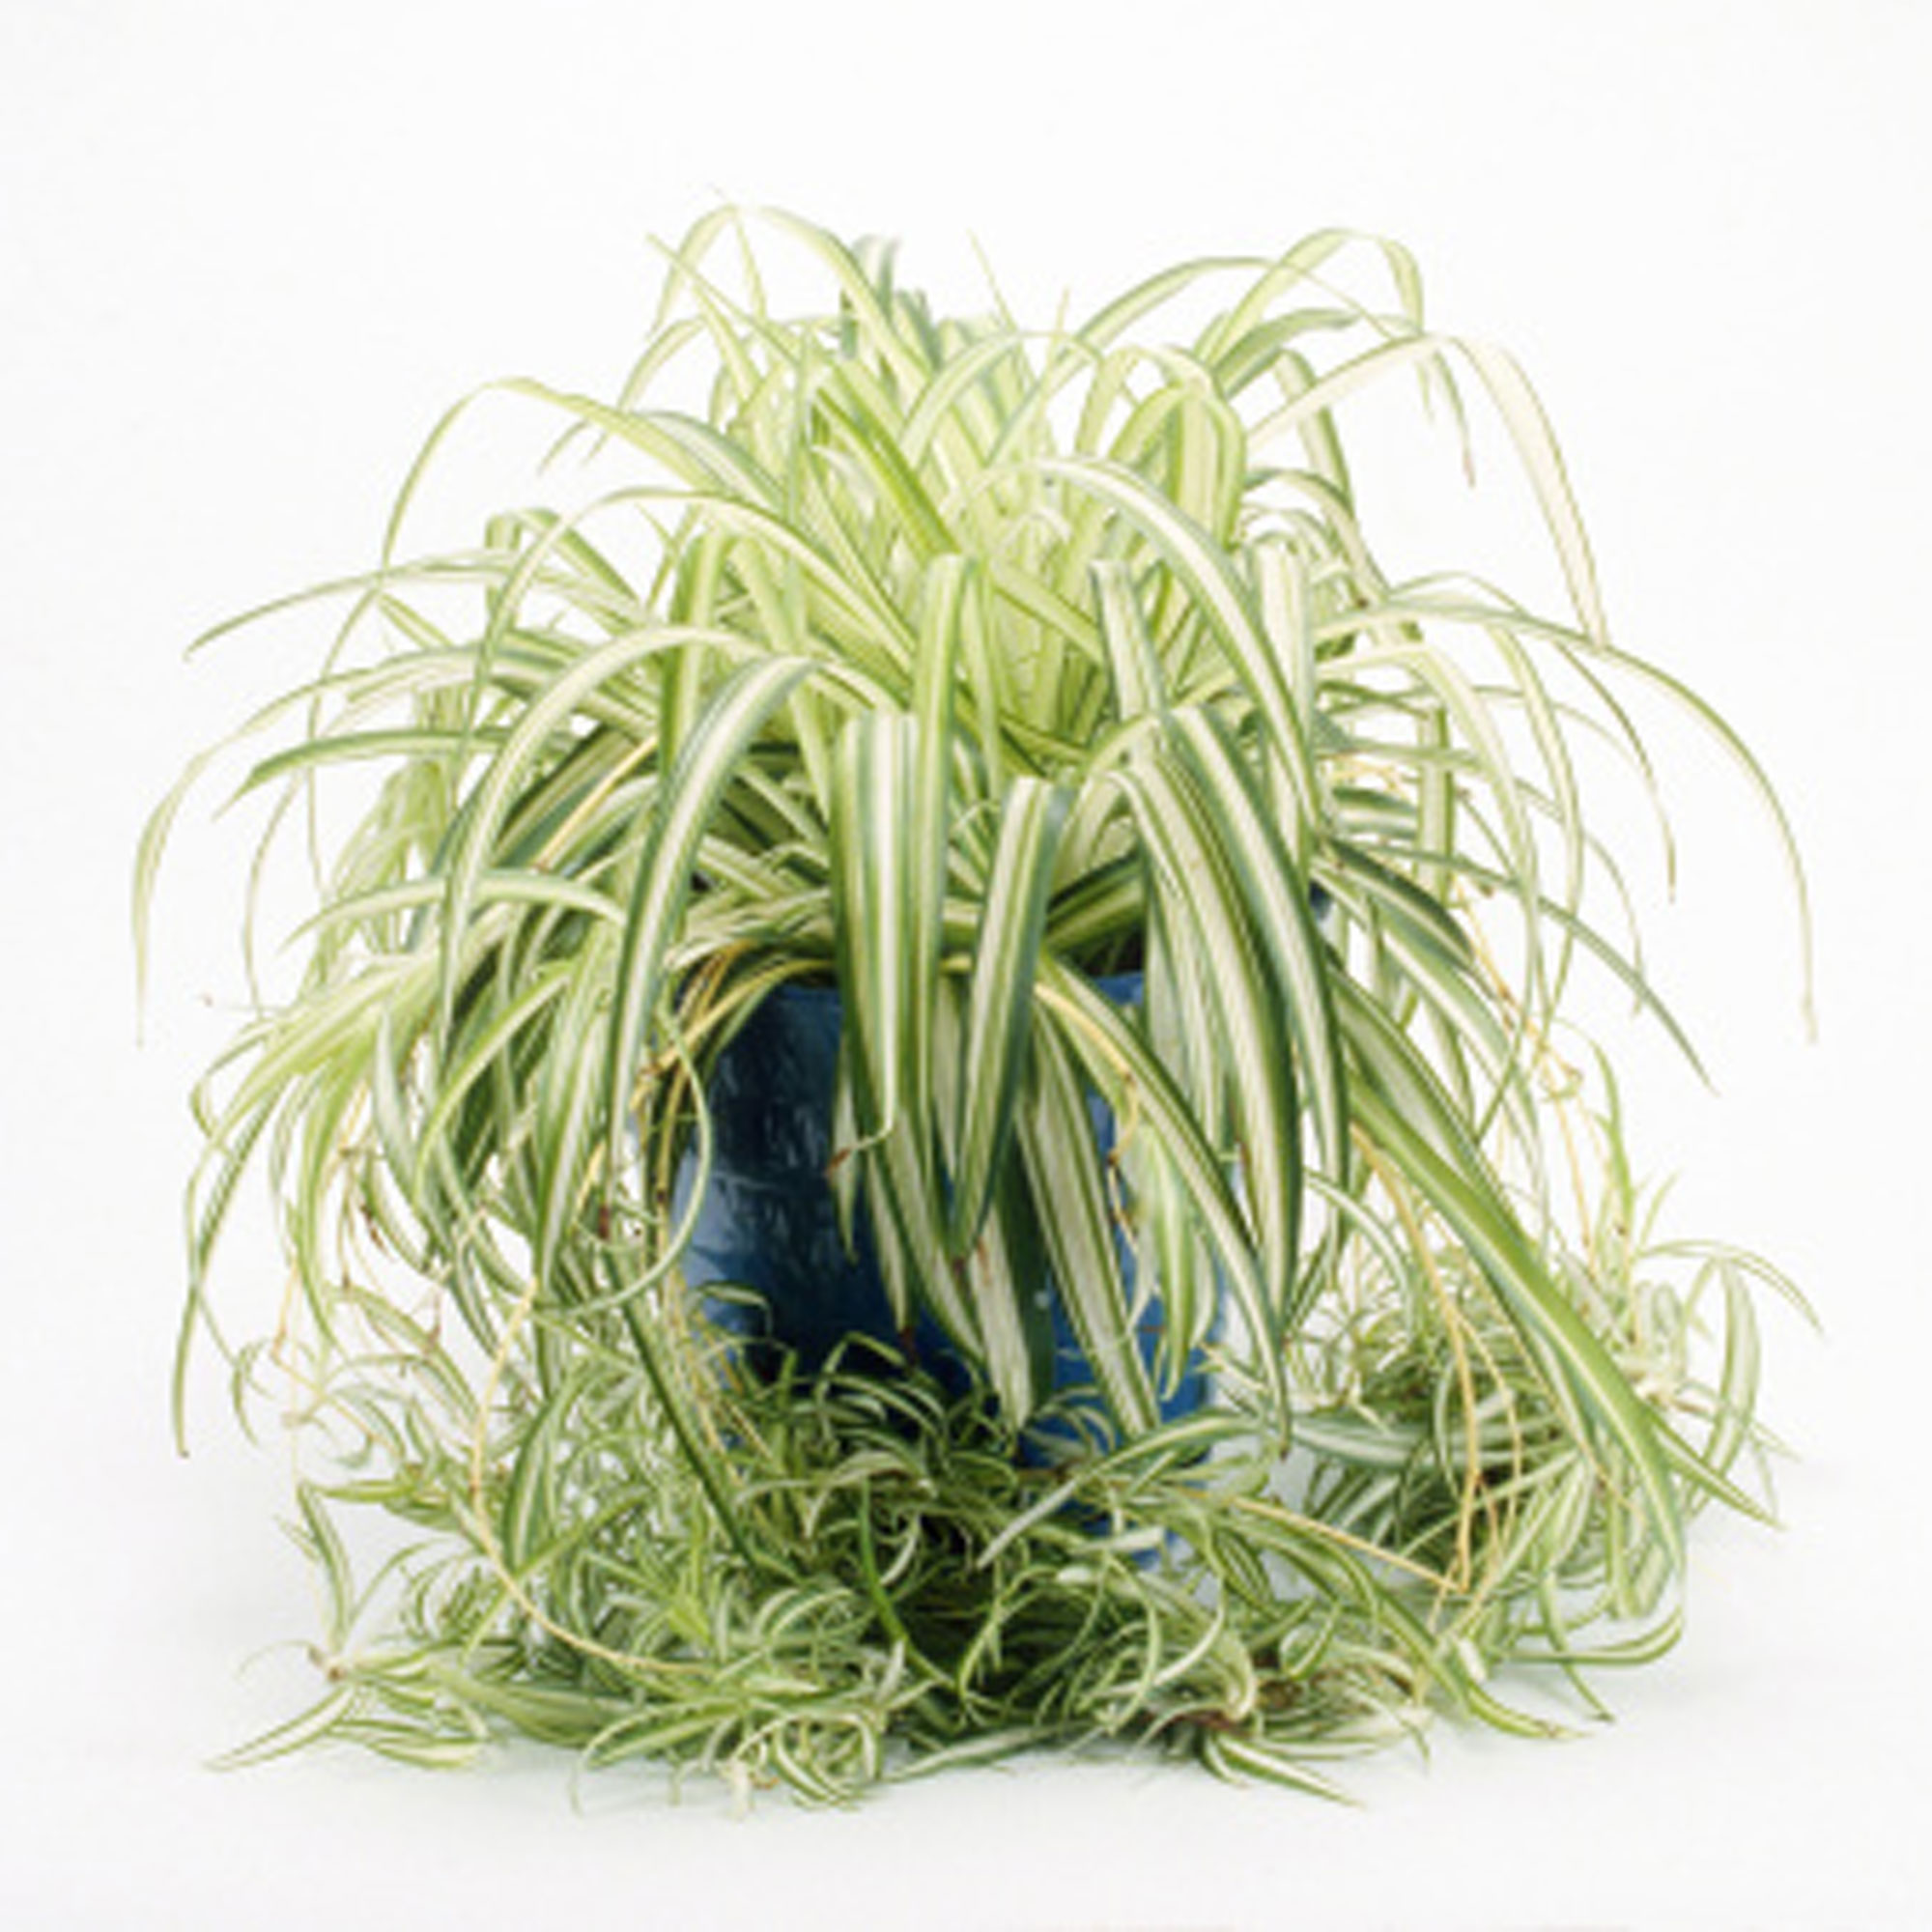 Growing Spider Plants Indoors: 10 Best Houseplants For Low Light